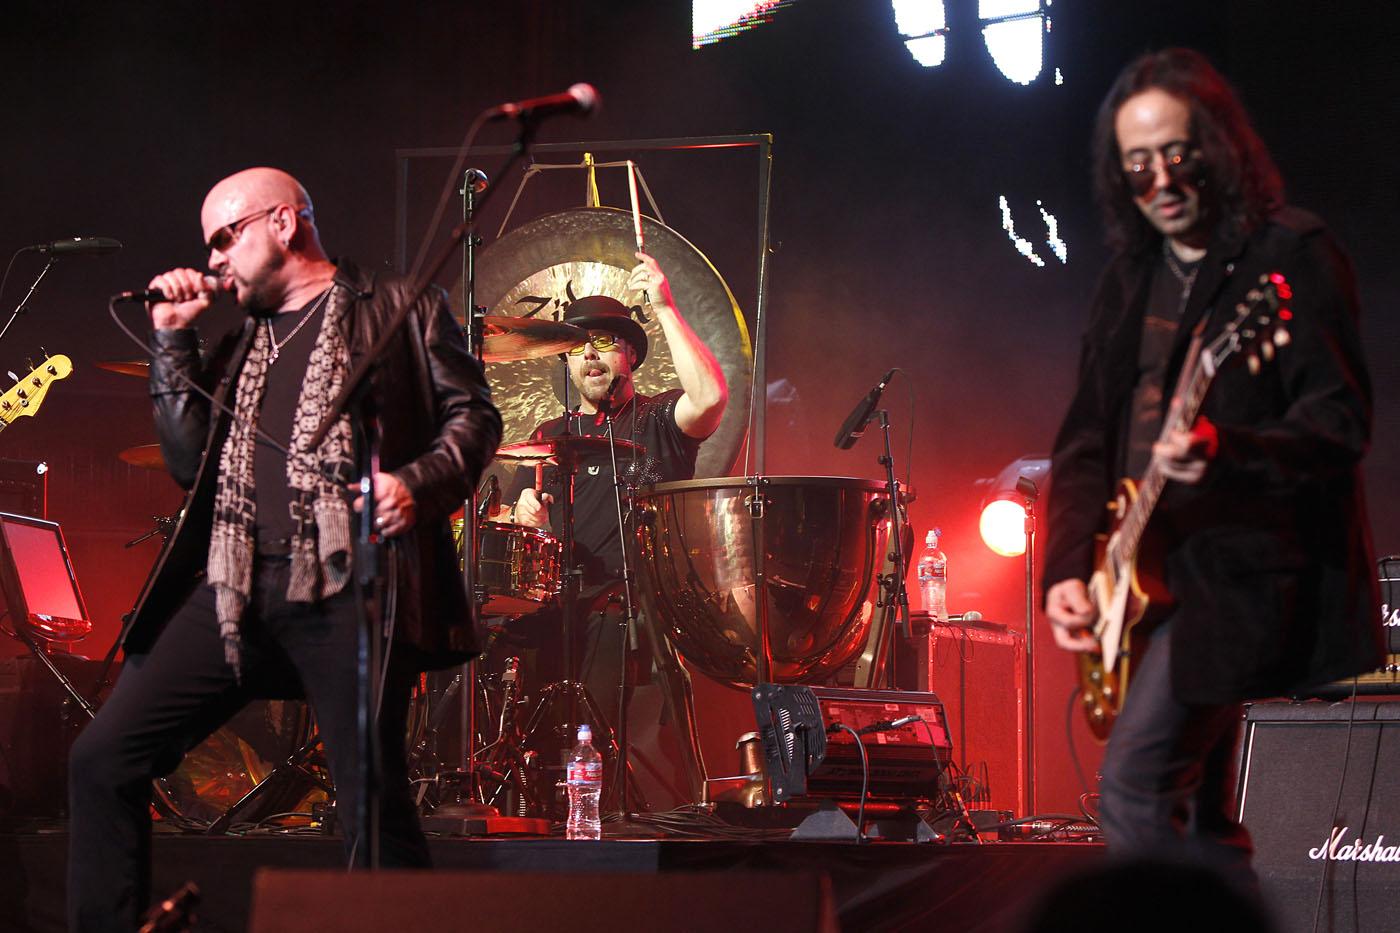 Led Zeppelin Cancelled Tour Dates